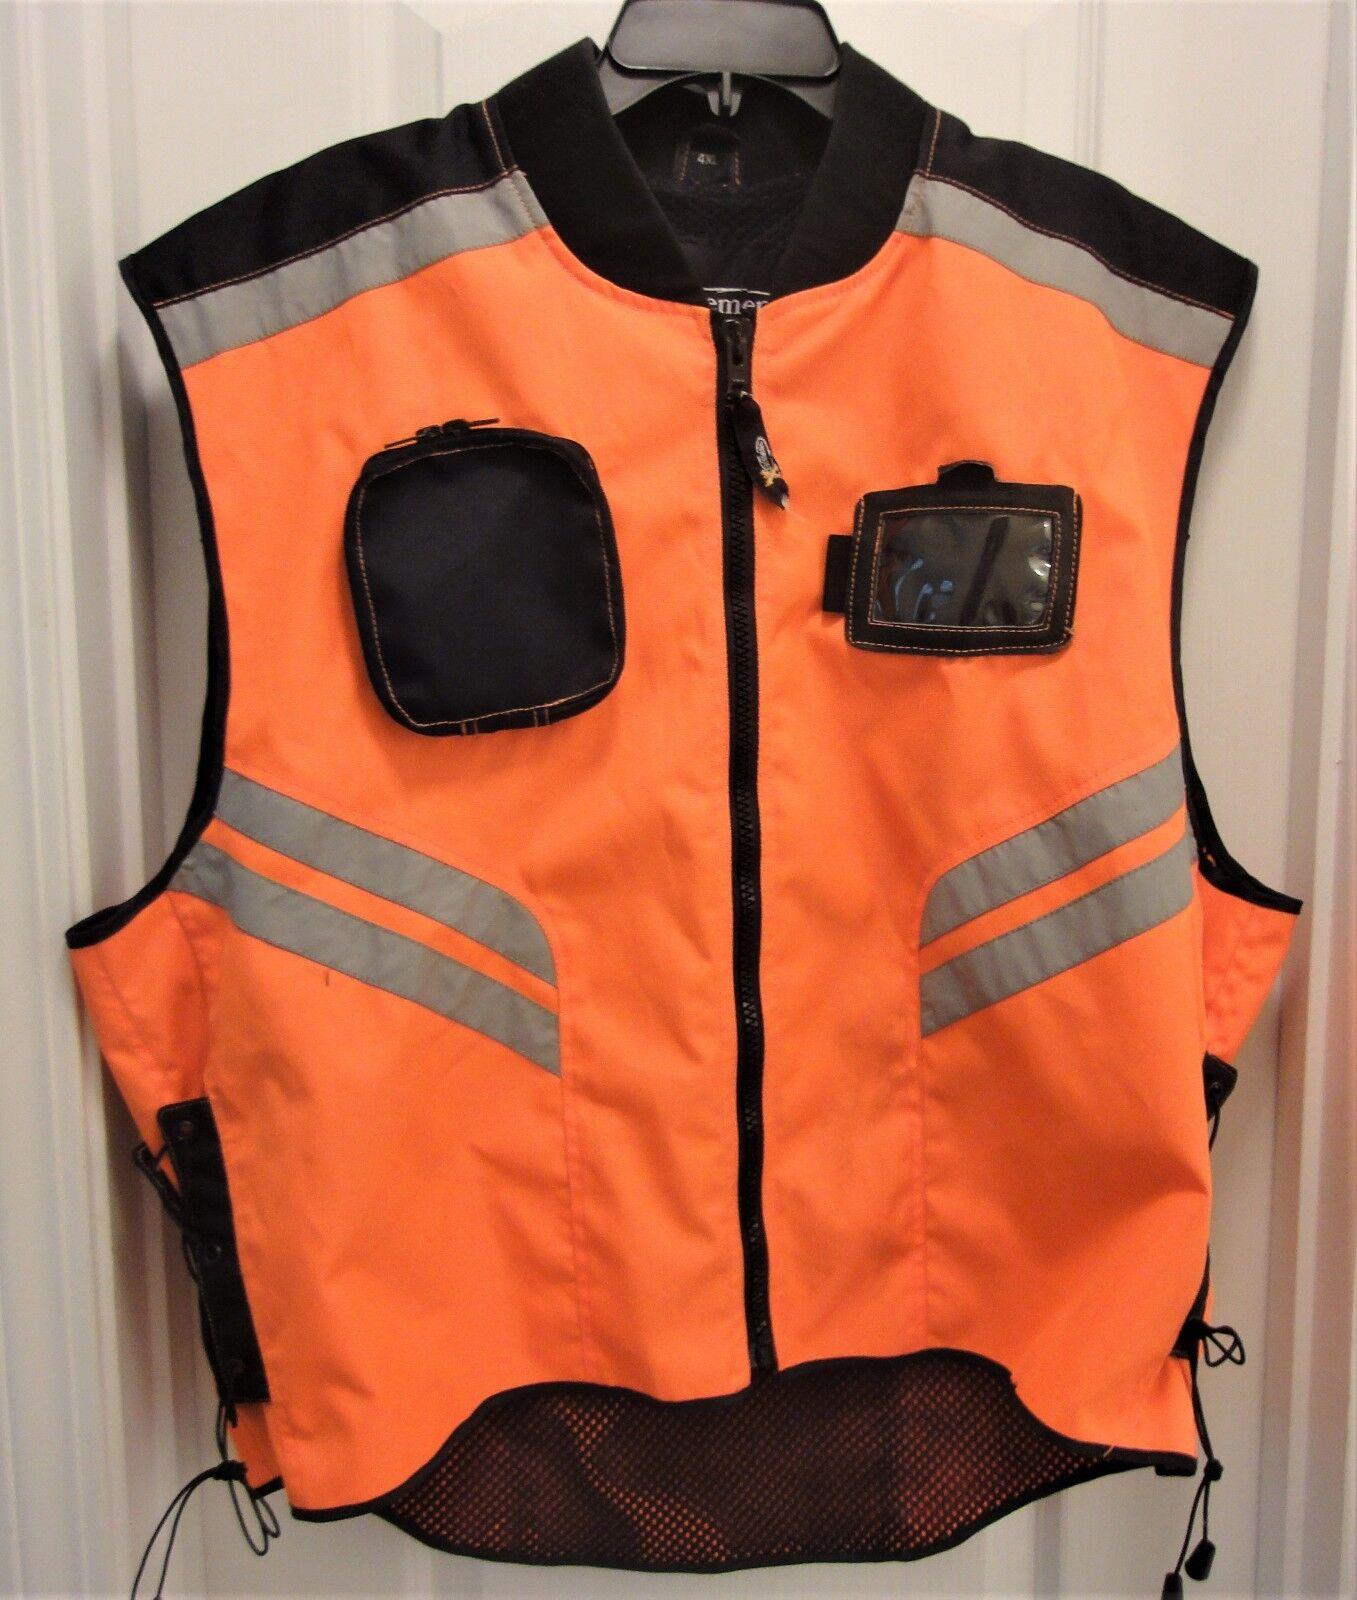 Mens Orange Safety Gear Motorcycle Vest Reflective Stripes High Visibility 4X